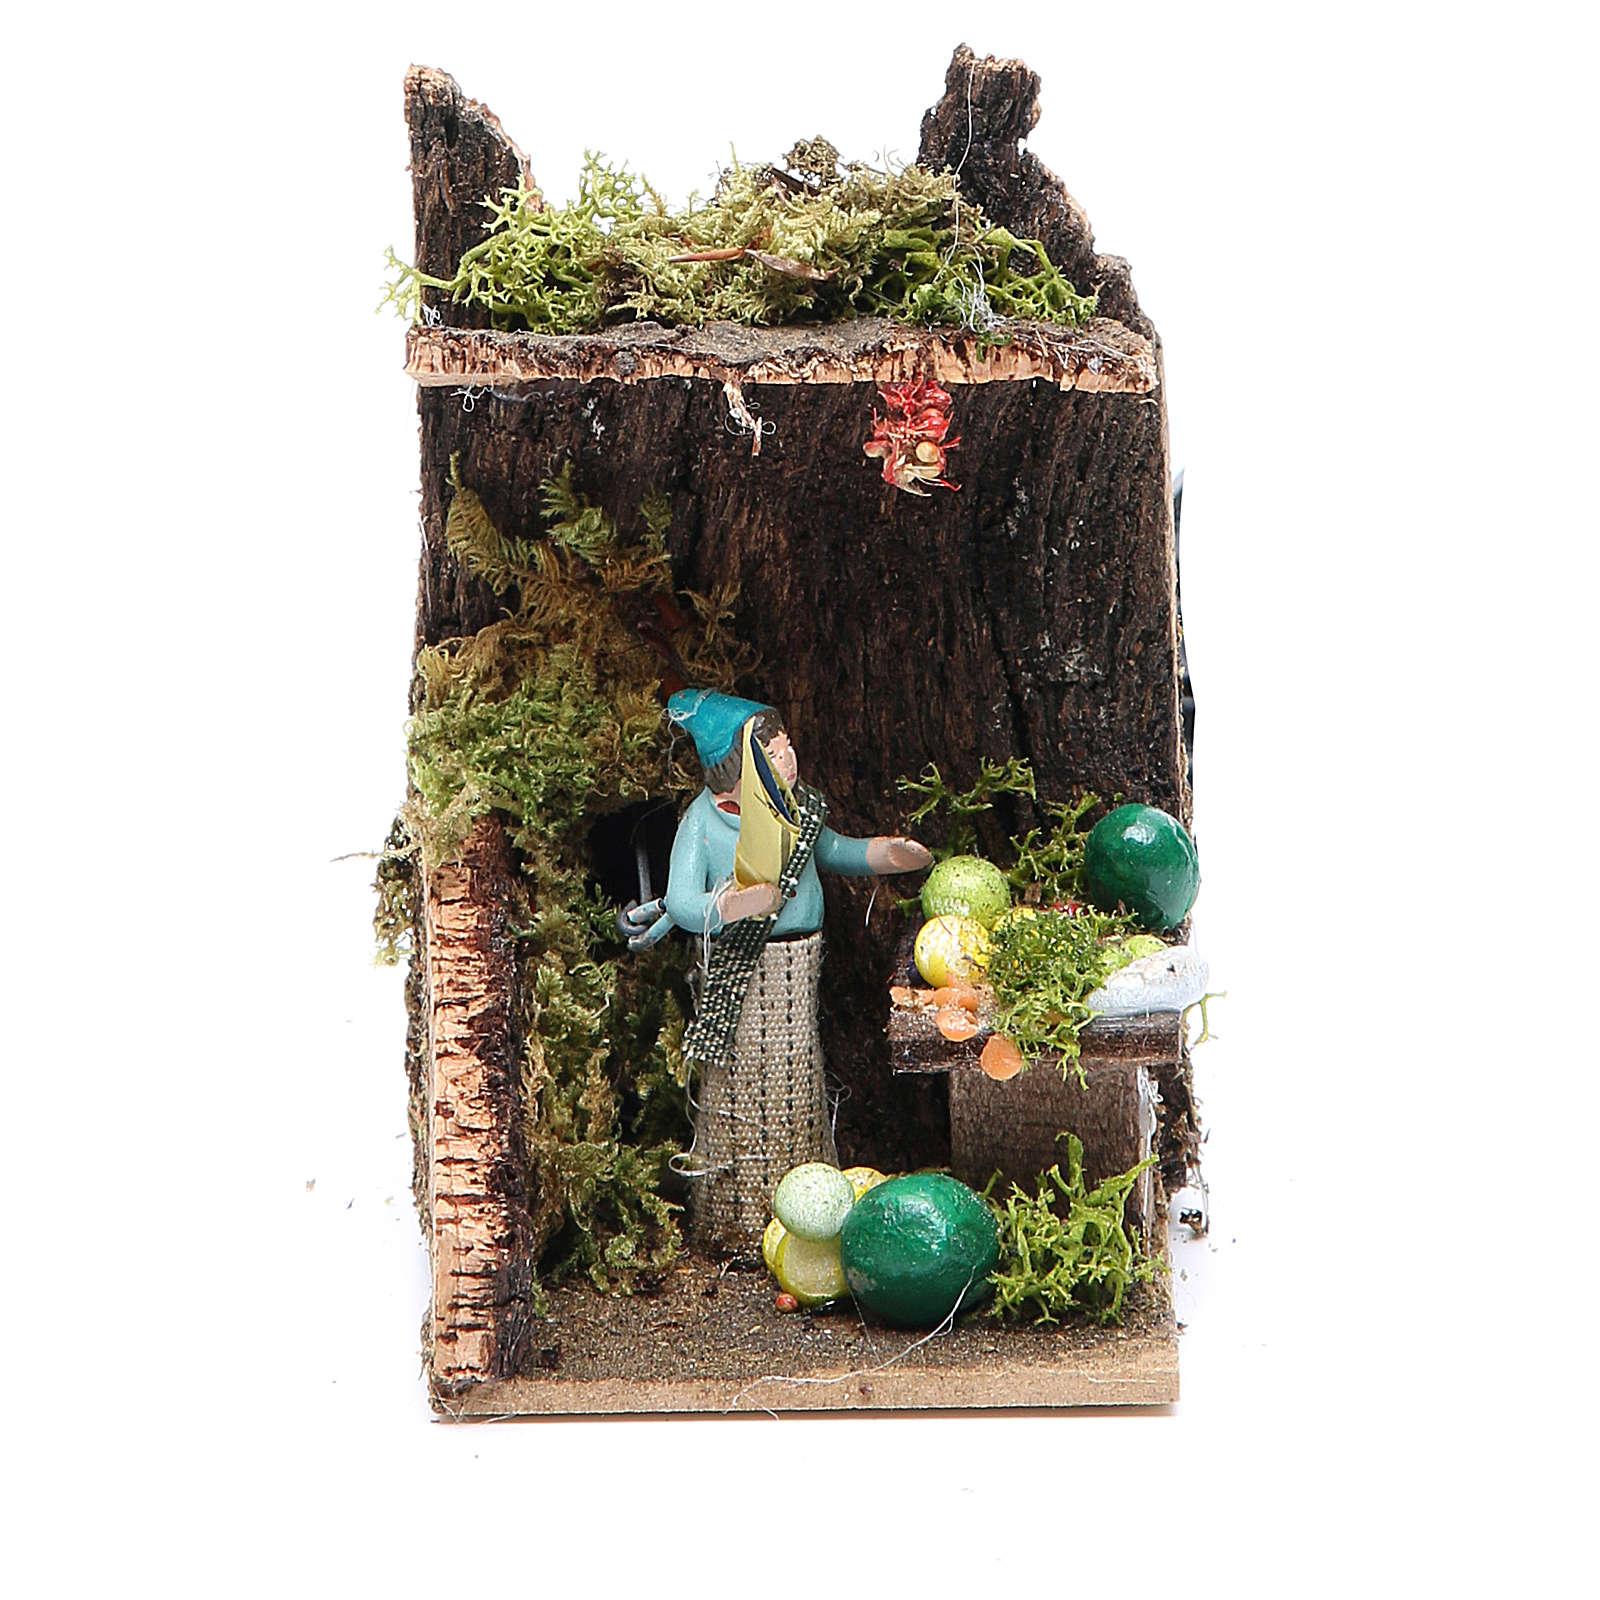 Fruit seller measuring 4cm, animated nativity figurine 3